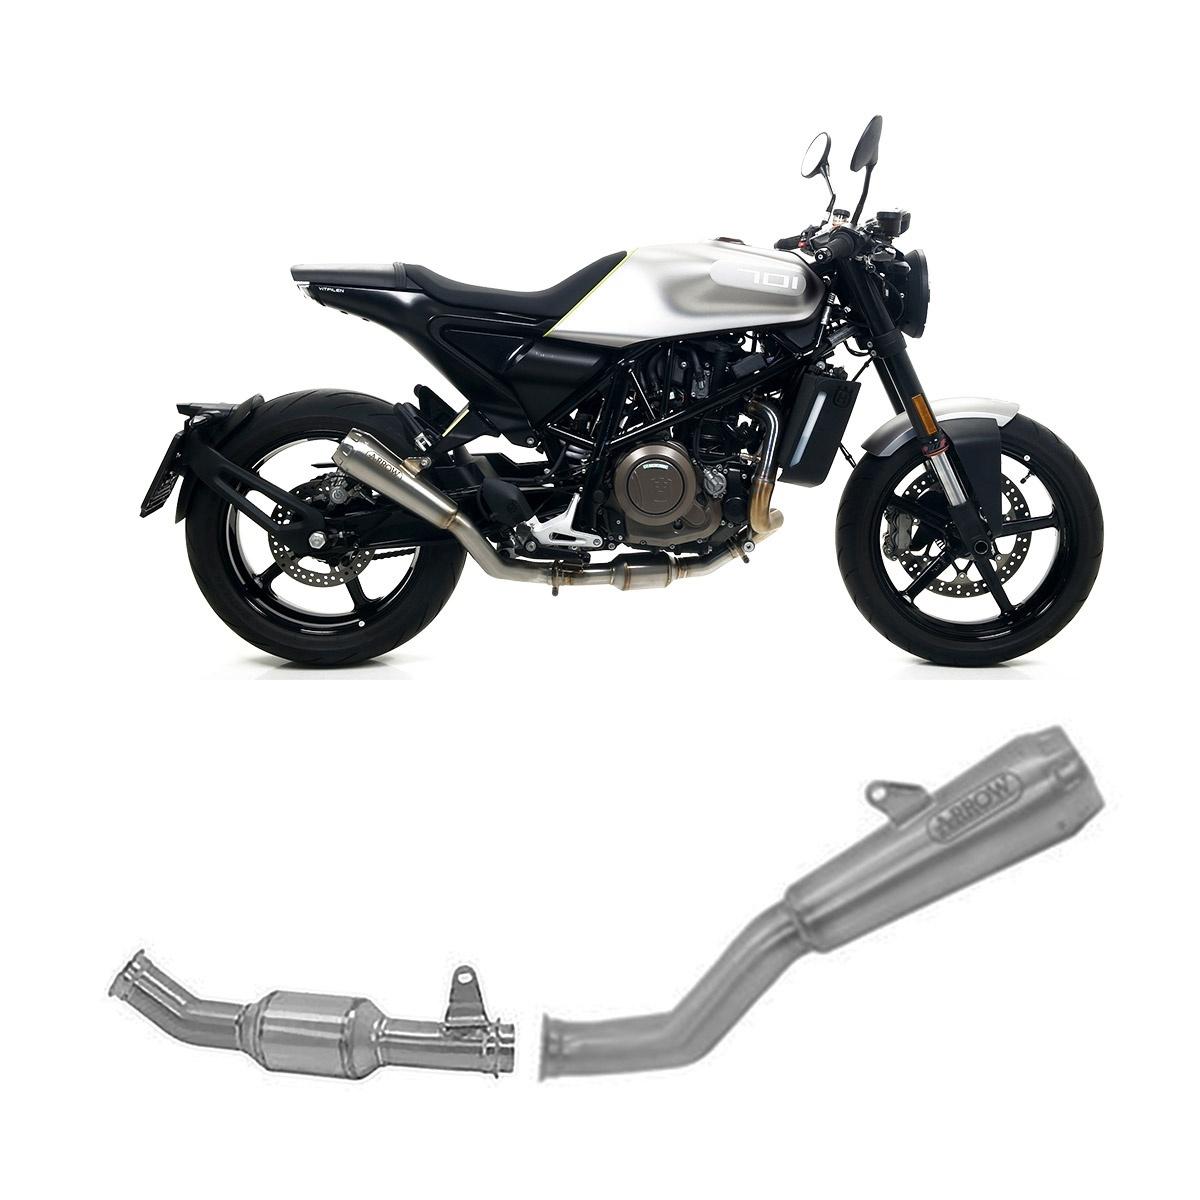 71703MI + 71891PR Exhaust System Arrow Titan Pro Race Tail Pipe Titan Husqvarna Vitpilen 701 2019 > 2020